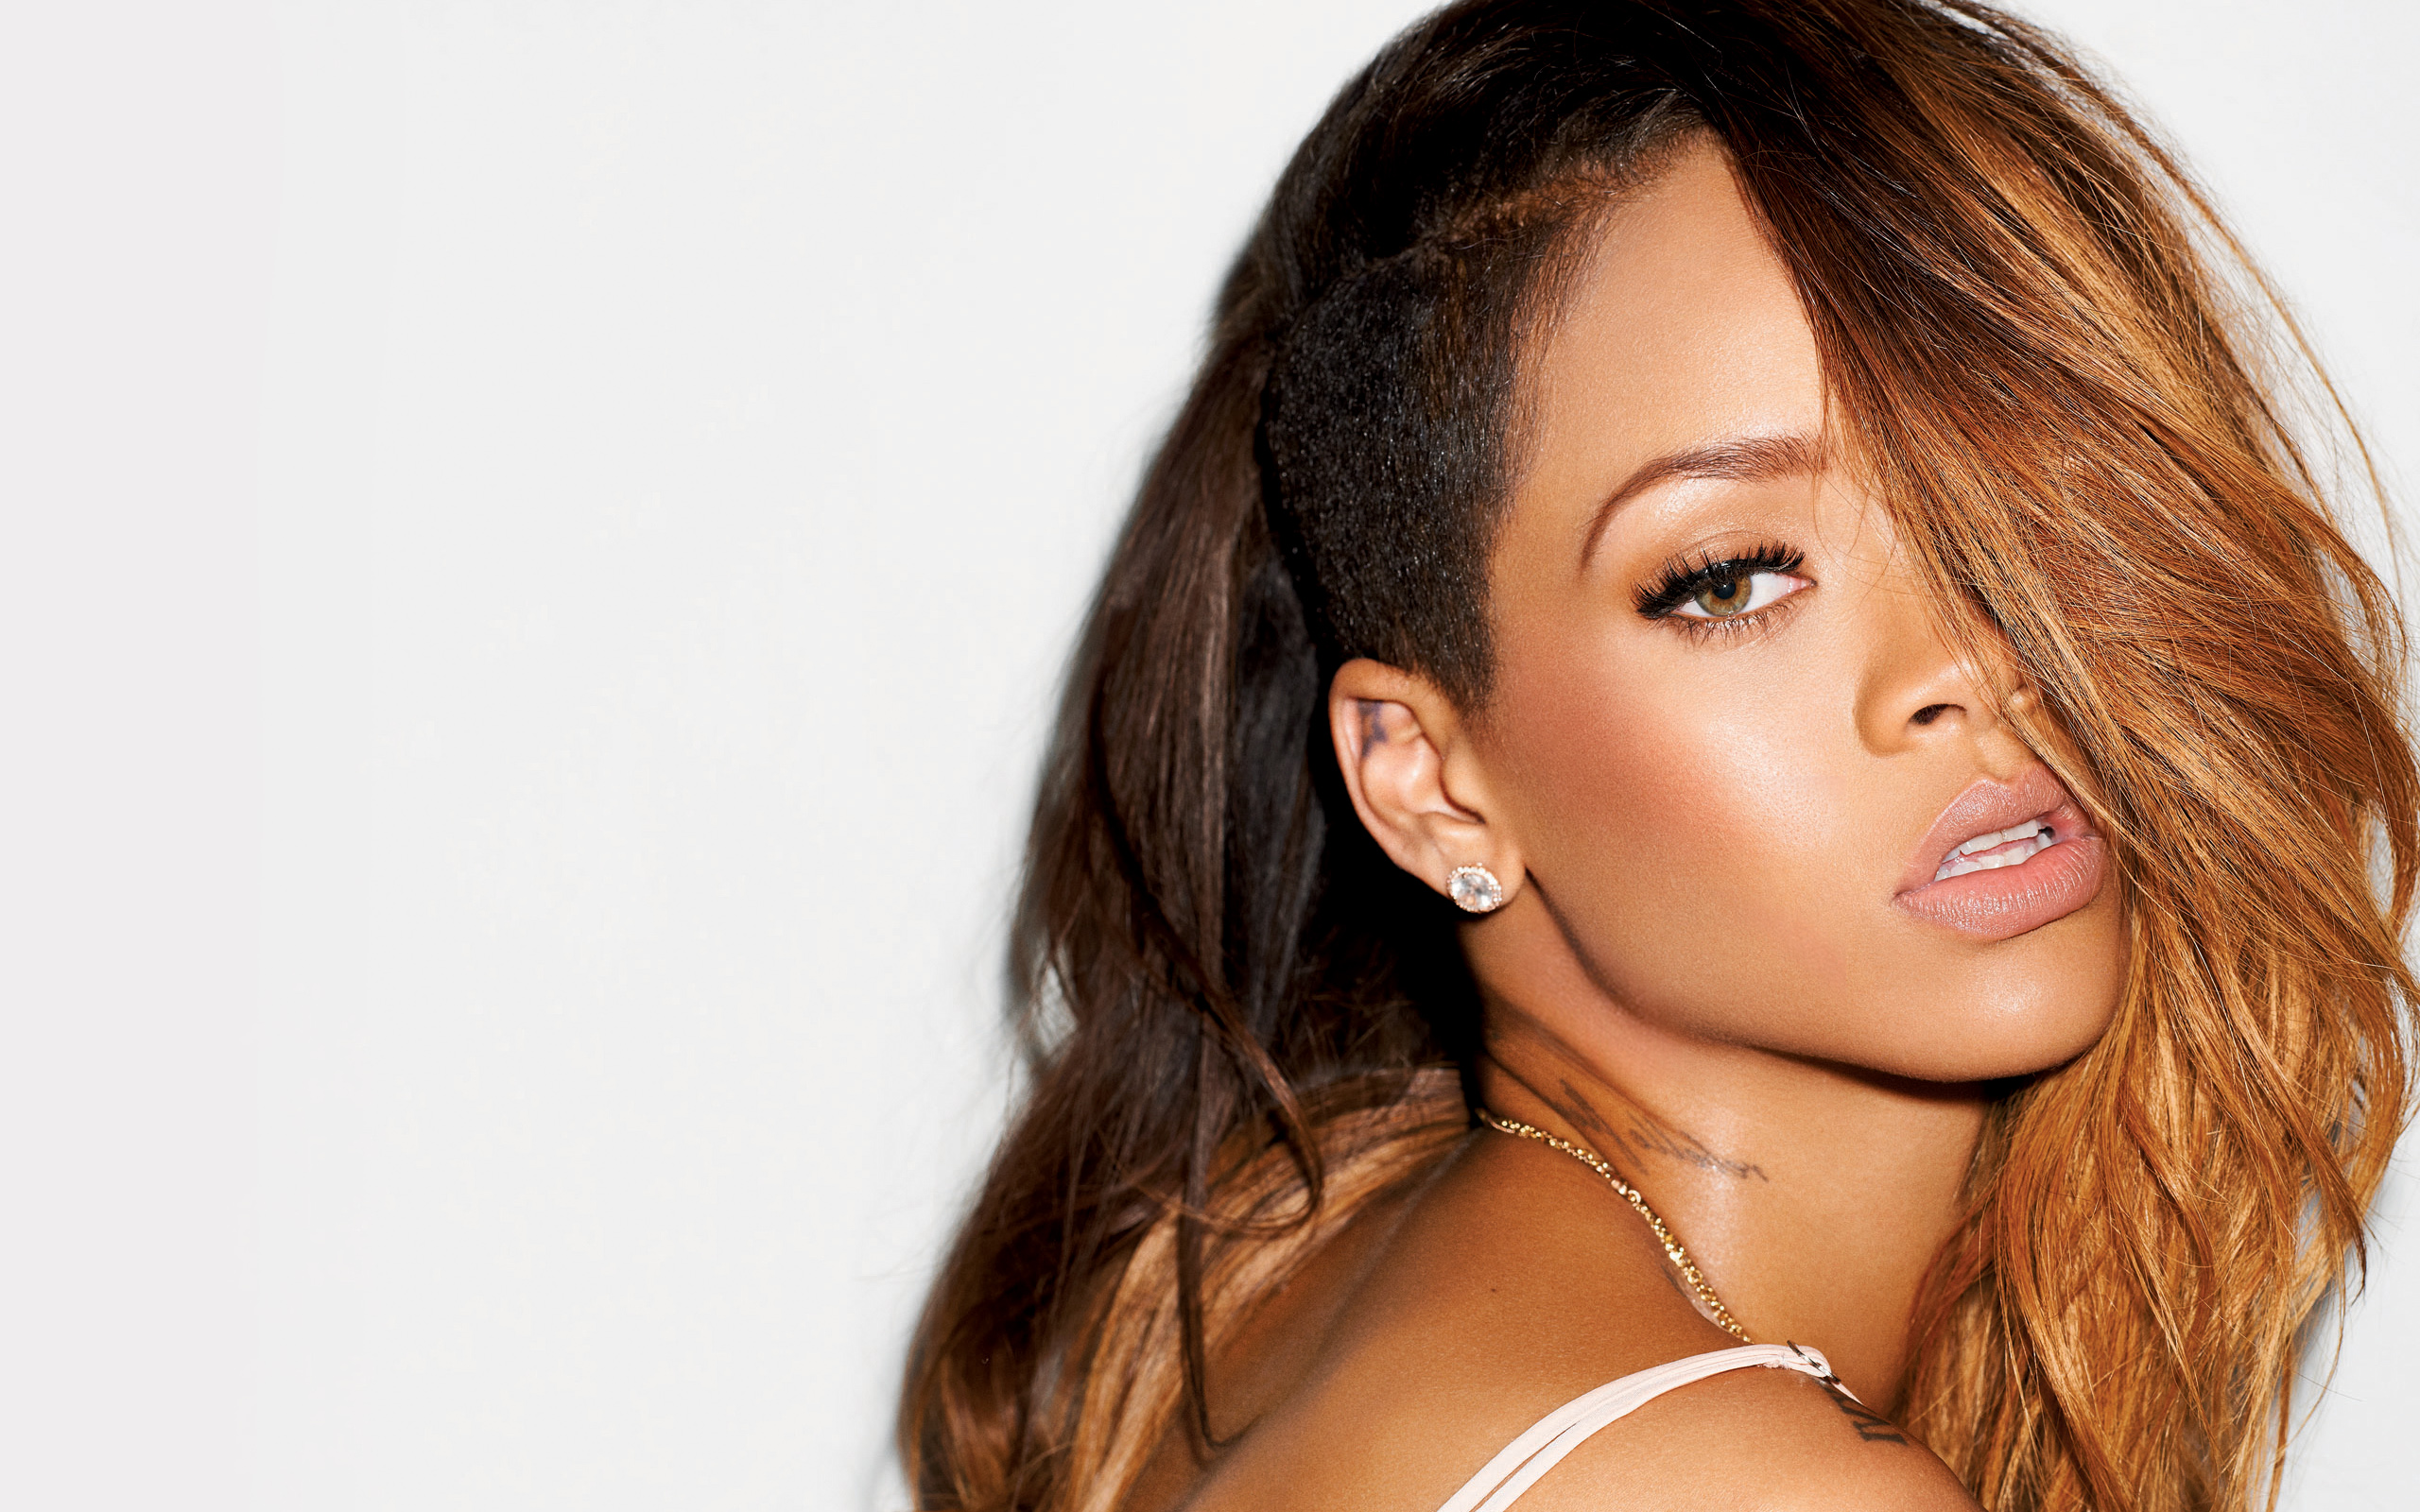 singer girl Rihanna portraint 2015 hd wallpaper 2560x1600